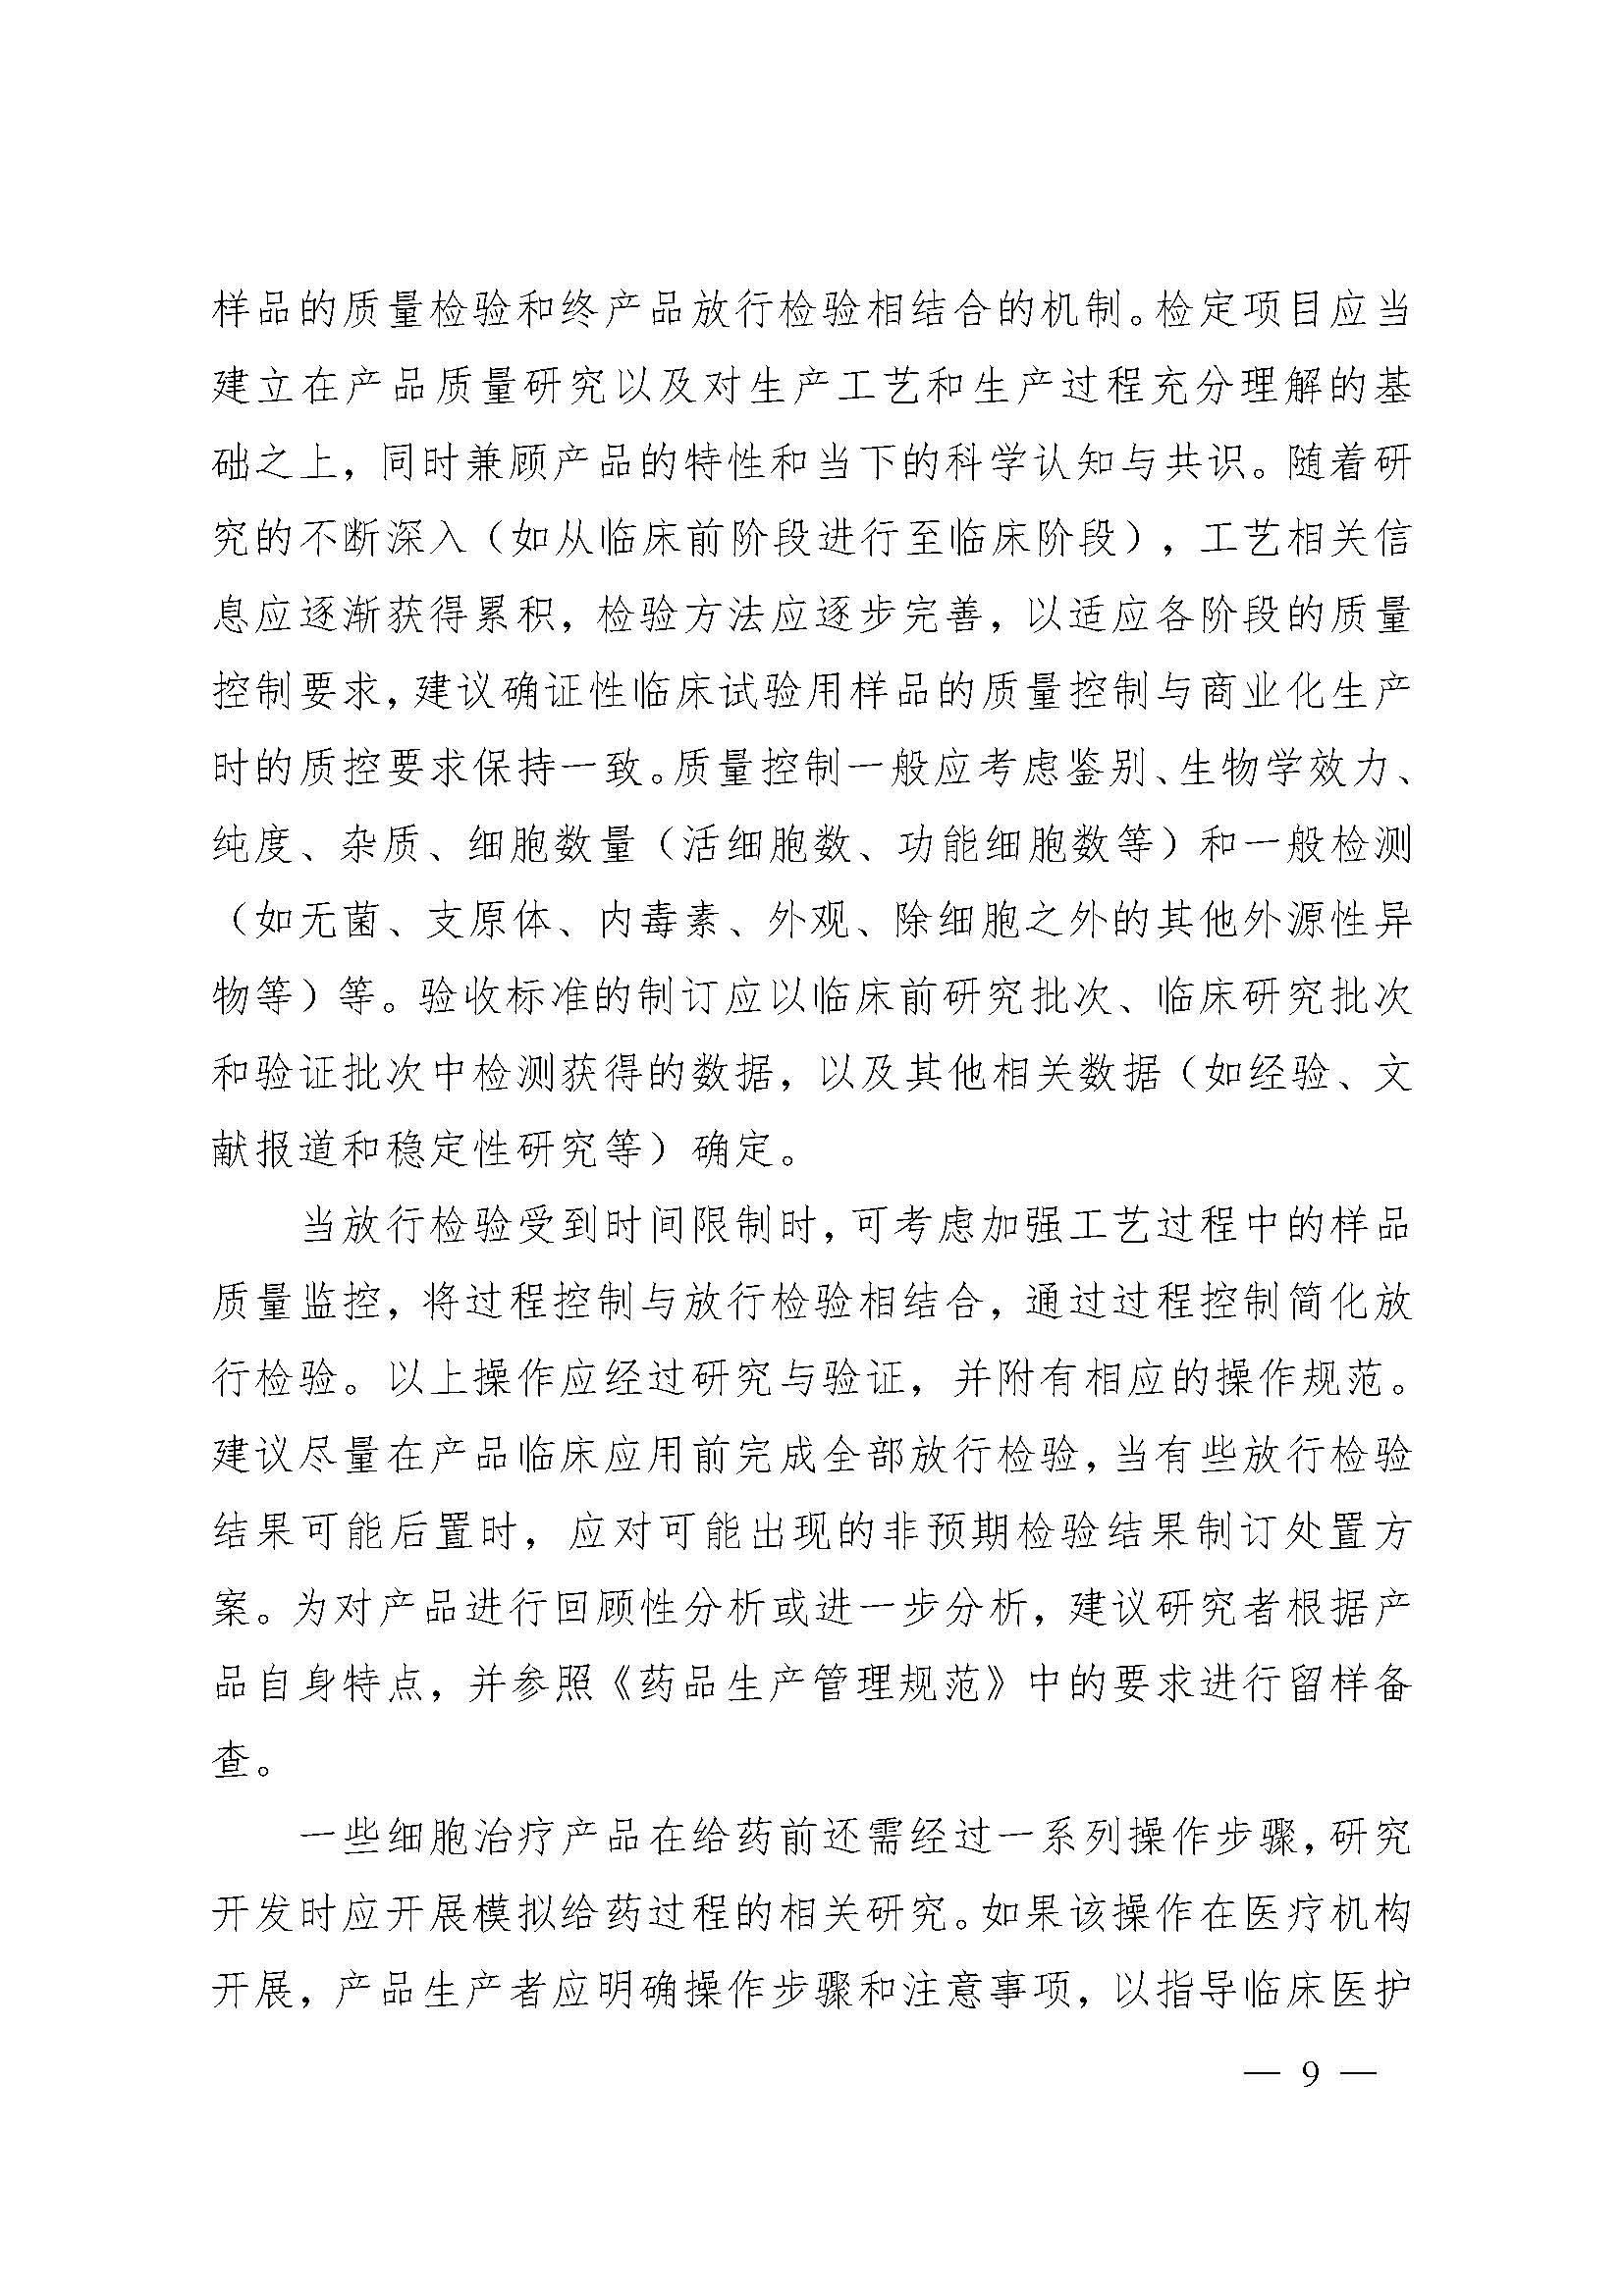 MjAxN8TqtdoyMTa6xc2ouOa4vbz+LmRvY3g=_页面_09.jpg